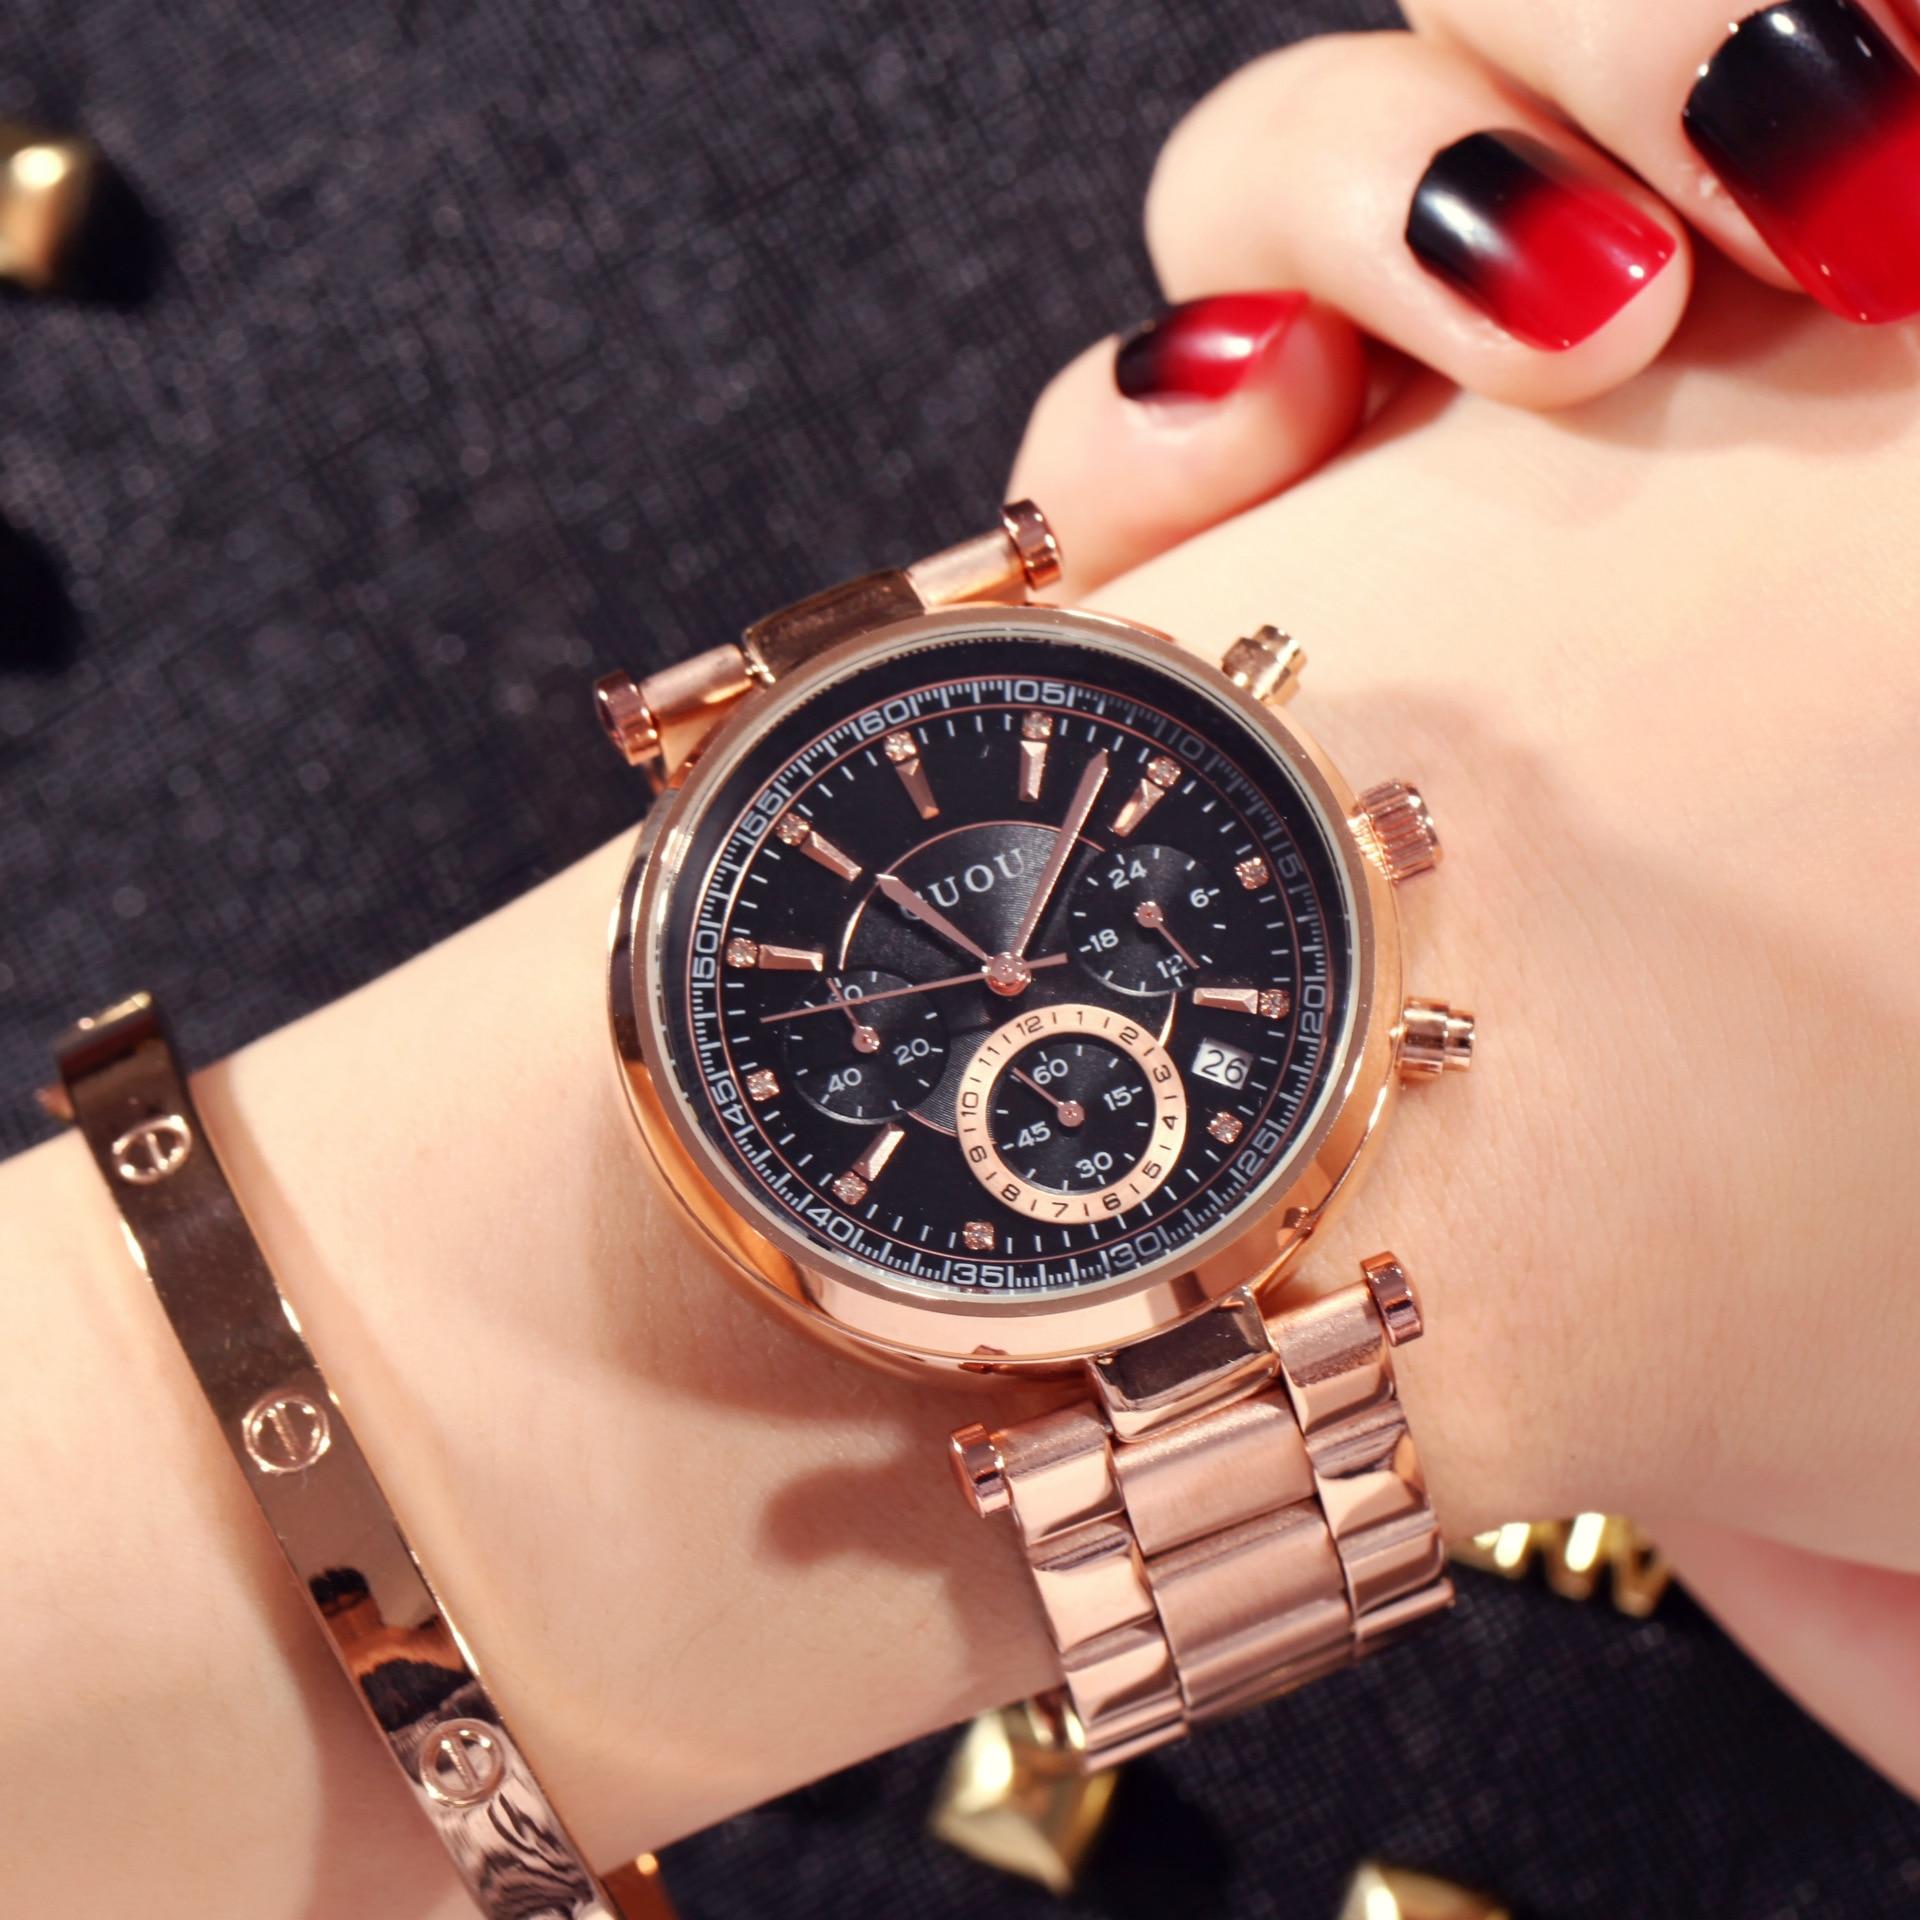 2018 TOP GUOU Brand Fashion Real 3 Eyes Work Rose Gold Steel Quartz Women Ladies Wrist Watch Bracelet Calendar Japan Movt Clock